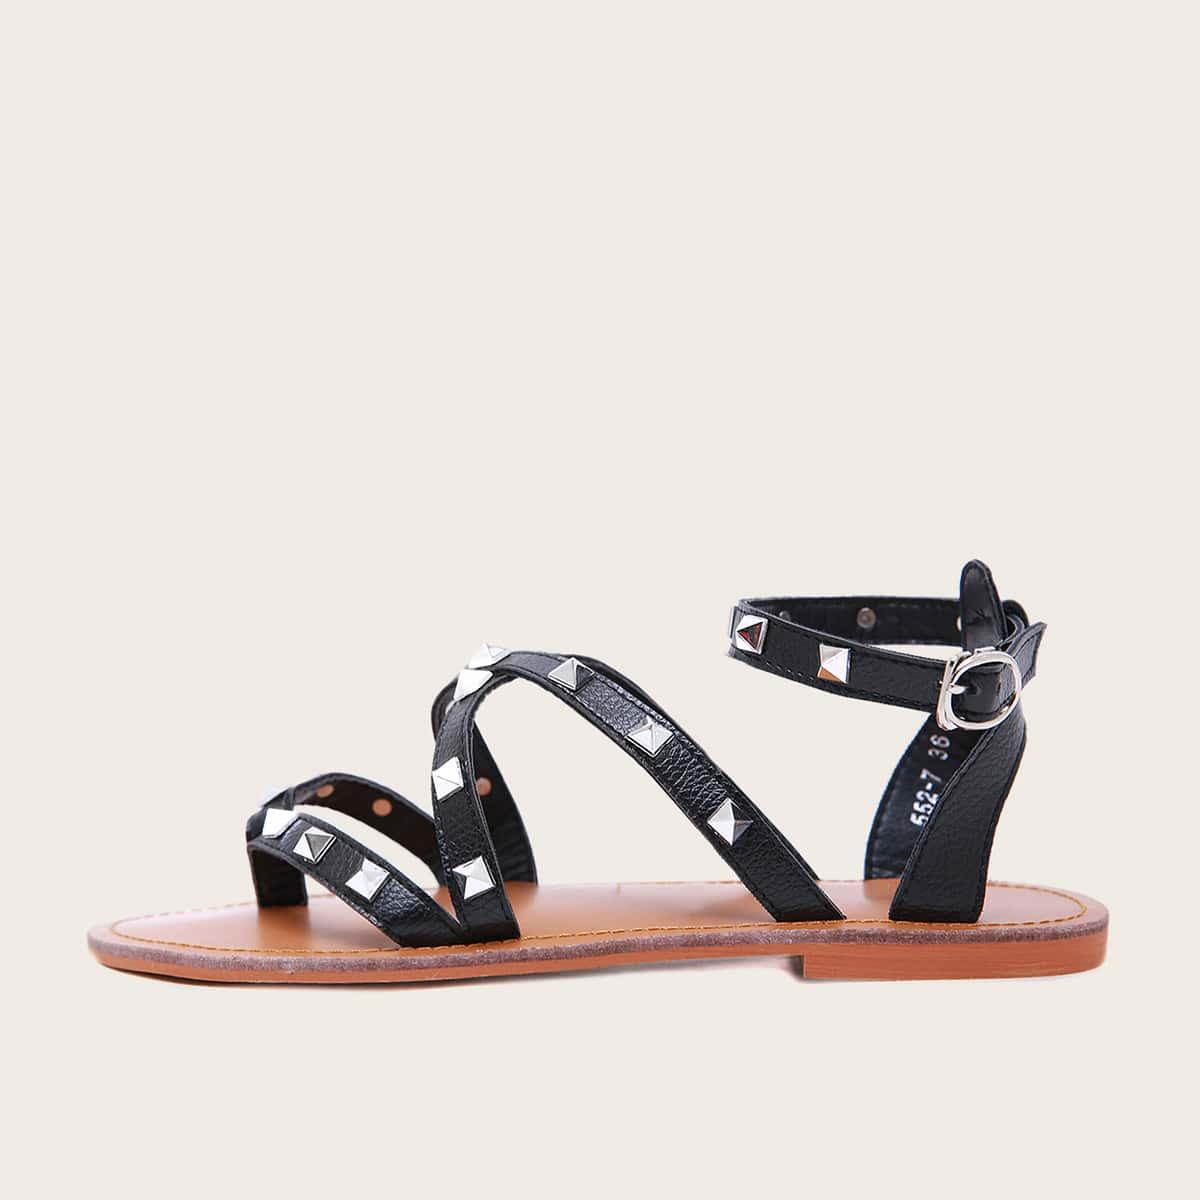 Sandalen met studs met studs en studs met studs